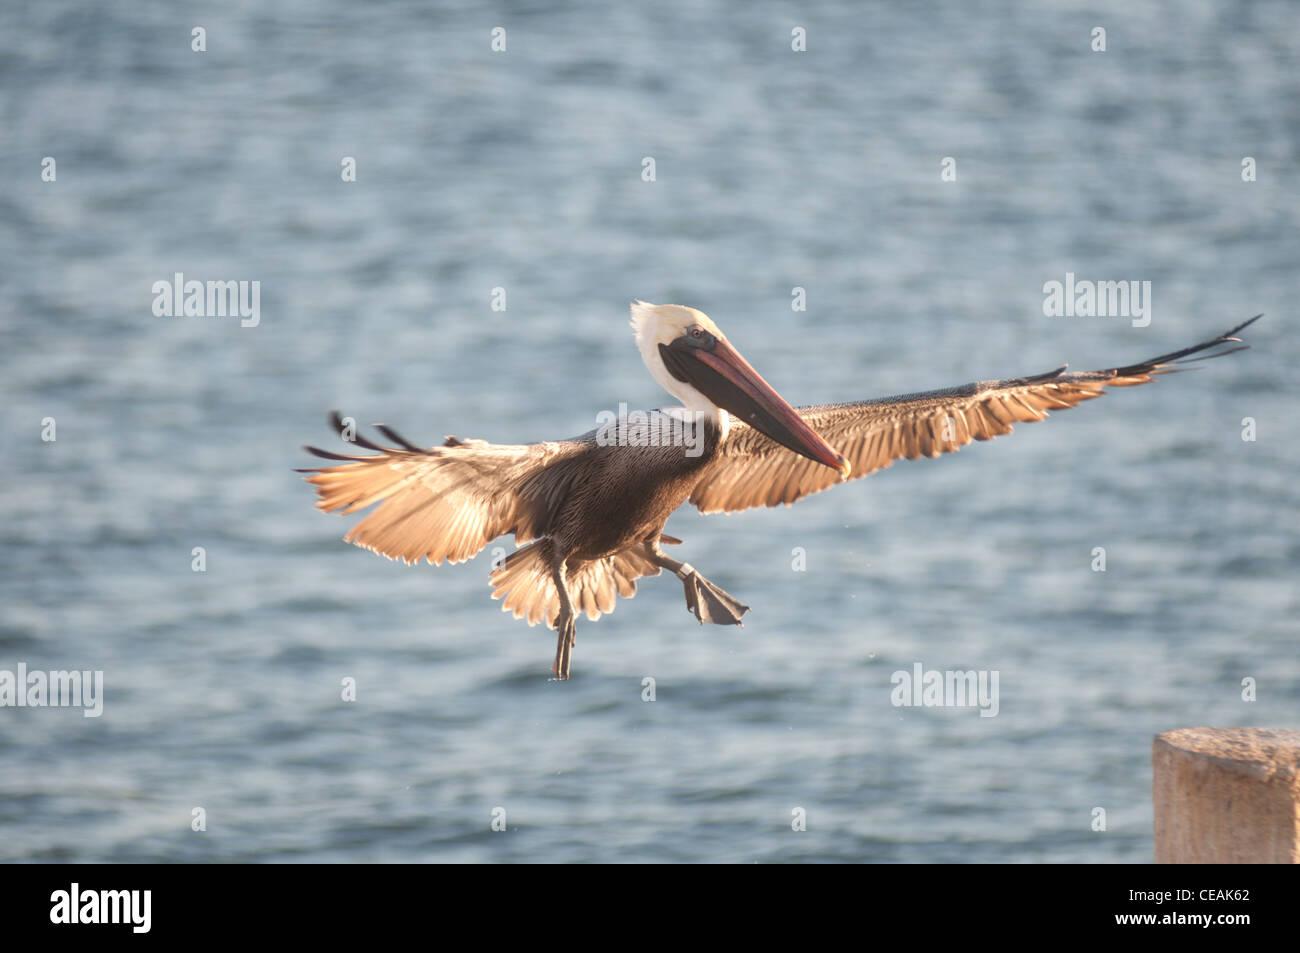 Brown Pelican, Pelecanus occidentalis, flying, Florida, North America, USA - Stock Image